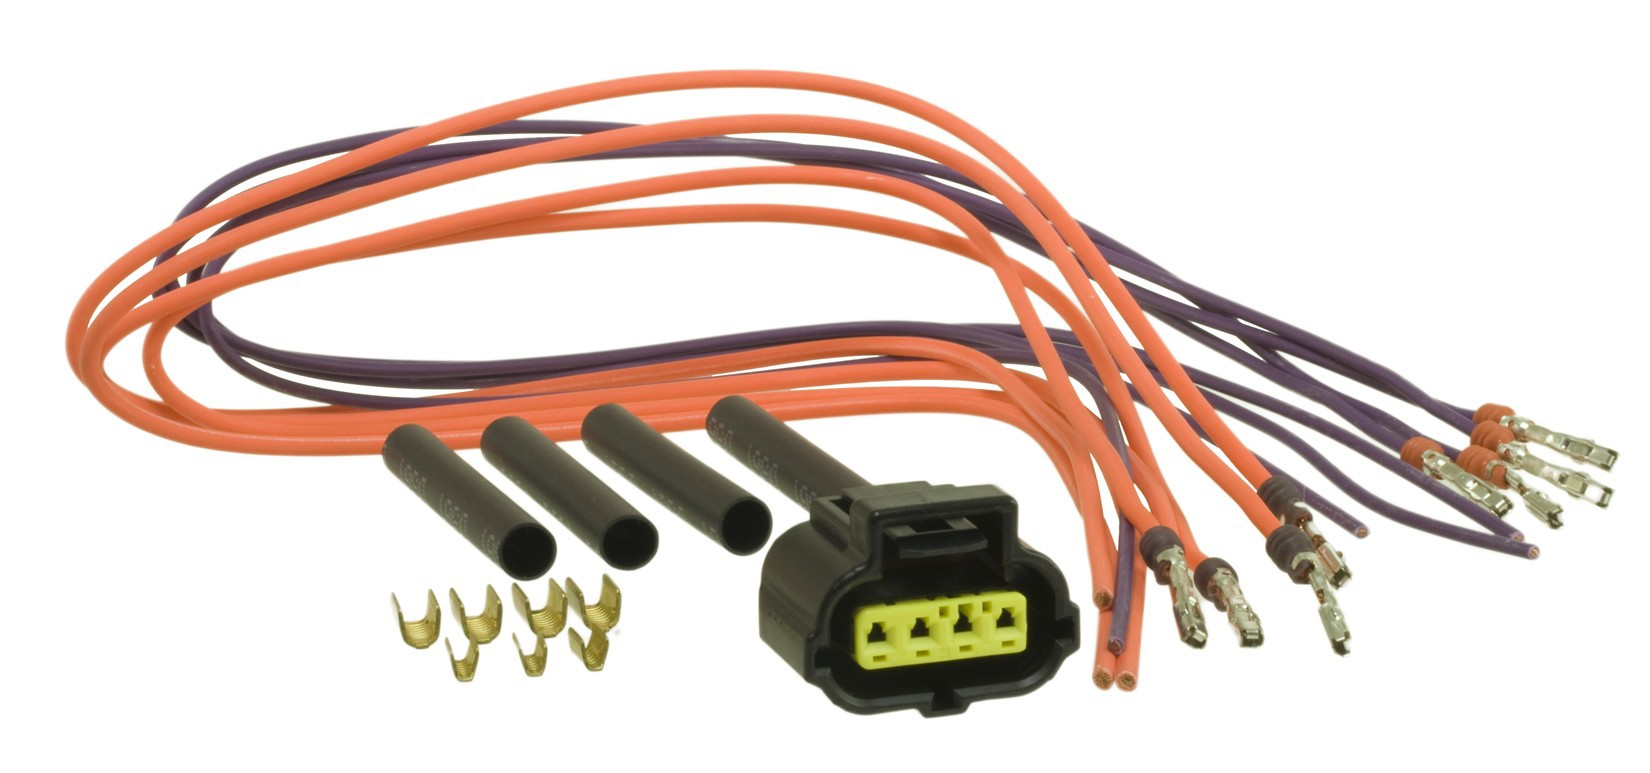 SYSTEMS - Throttle Position Sensor Connector